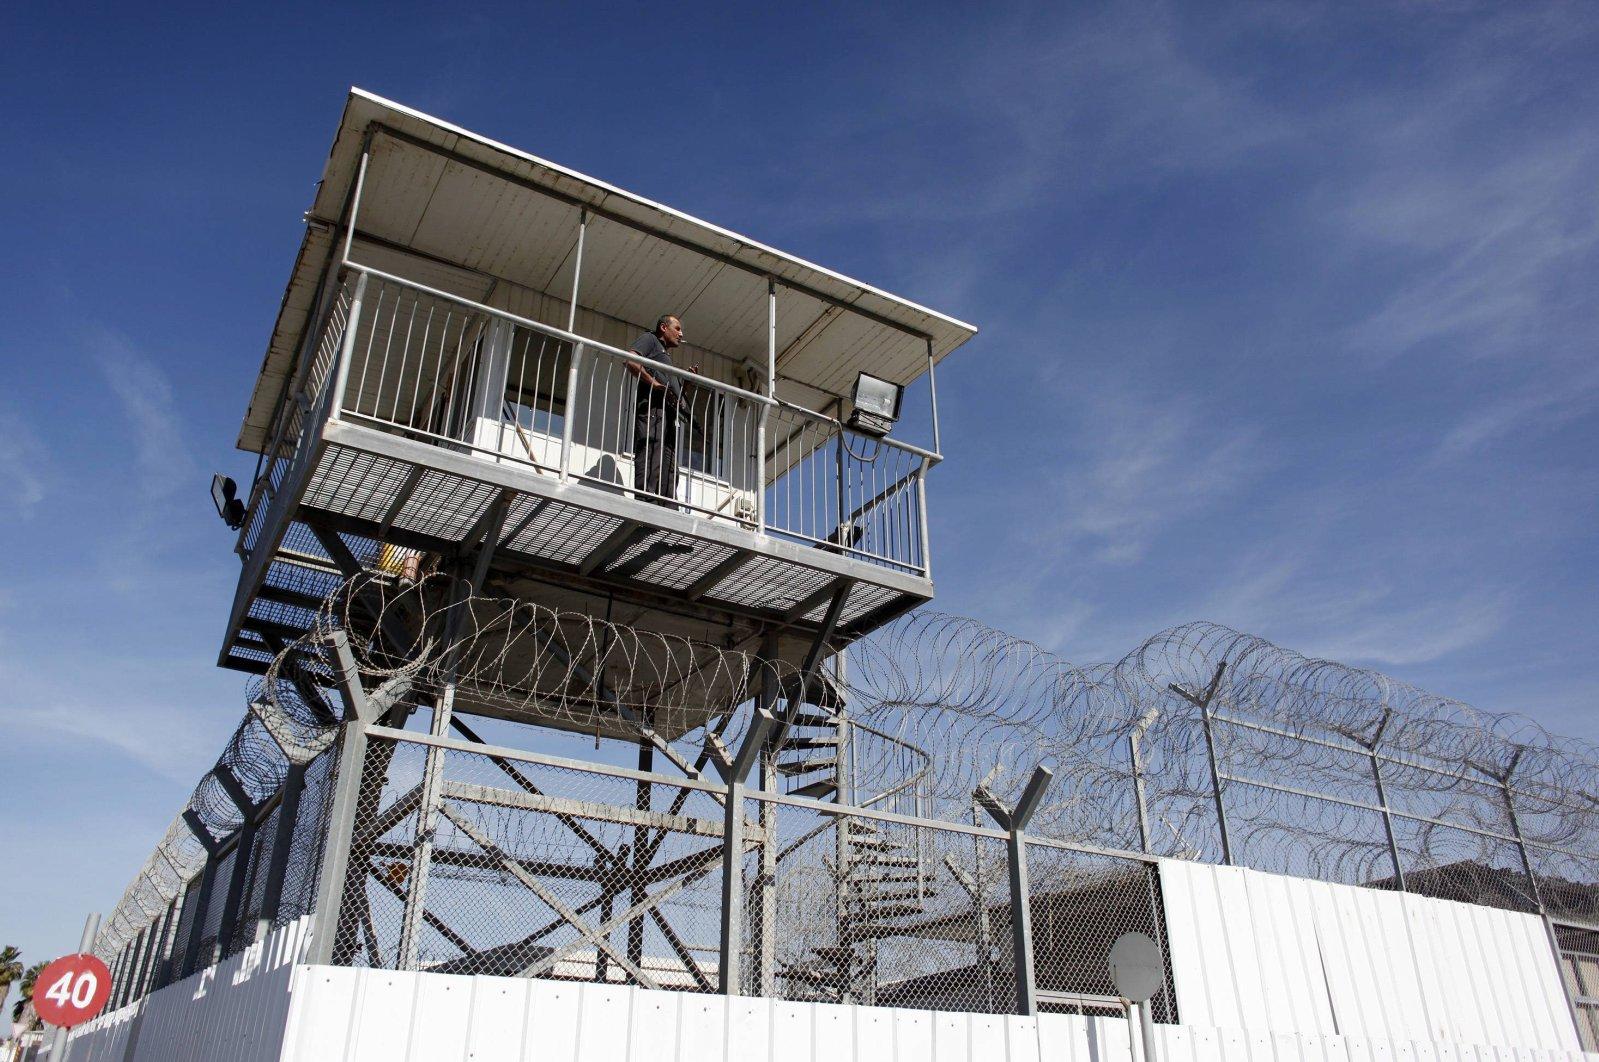 An Israeli prison guard keeps watch from a tower at Ayalon prison, Ramle near Tel Aviv, Israel, Feb. 13, 2013. (Reuters Photo)